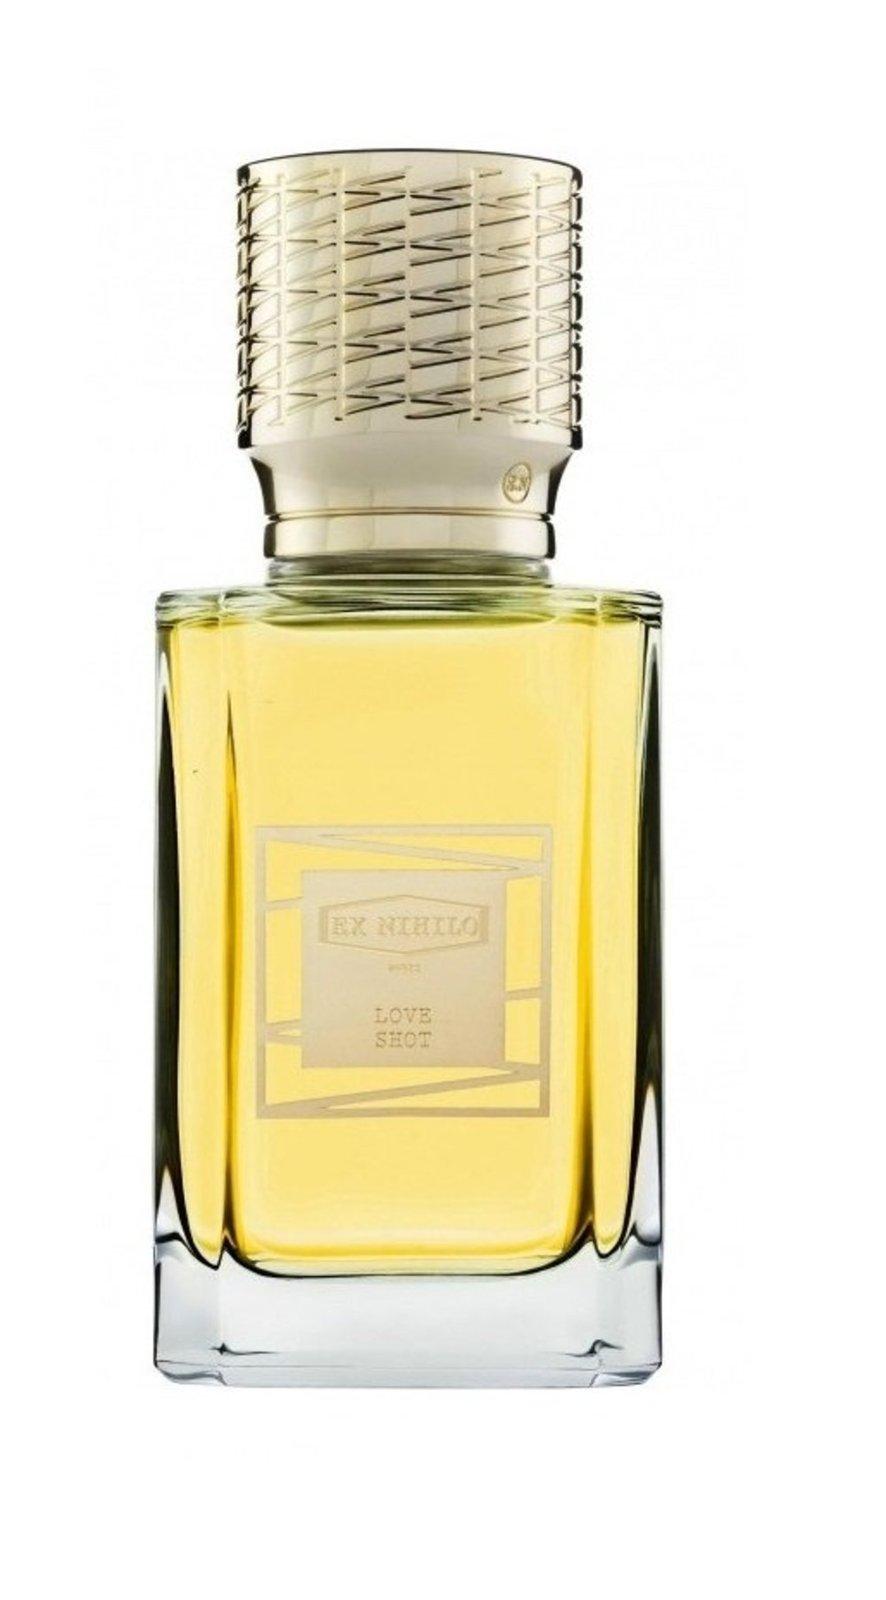 LOVE SHOT by EX NIHILO 5ml Travel Spray PARFUM Perfume RASBERRY LEATHER MUSK